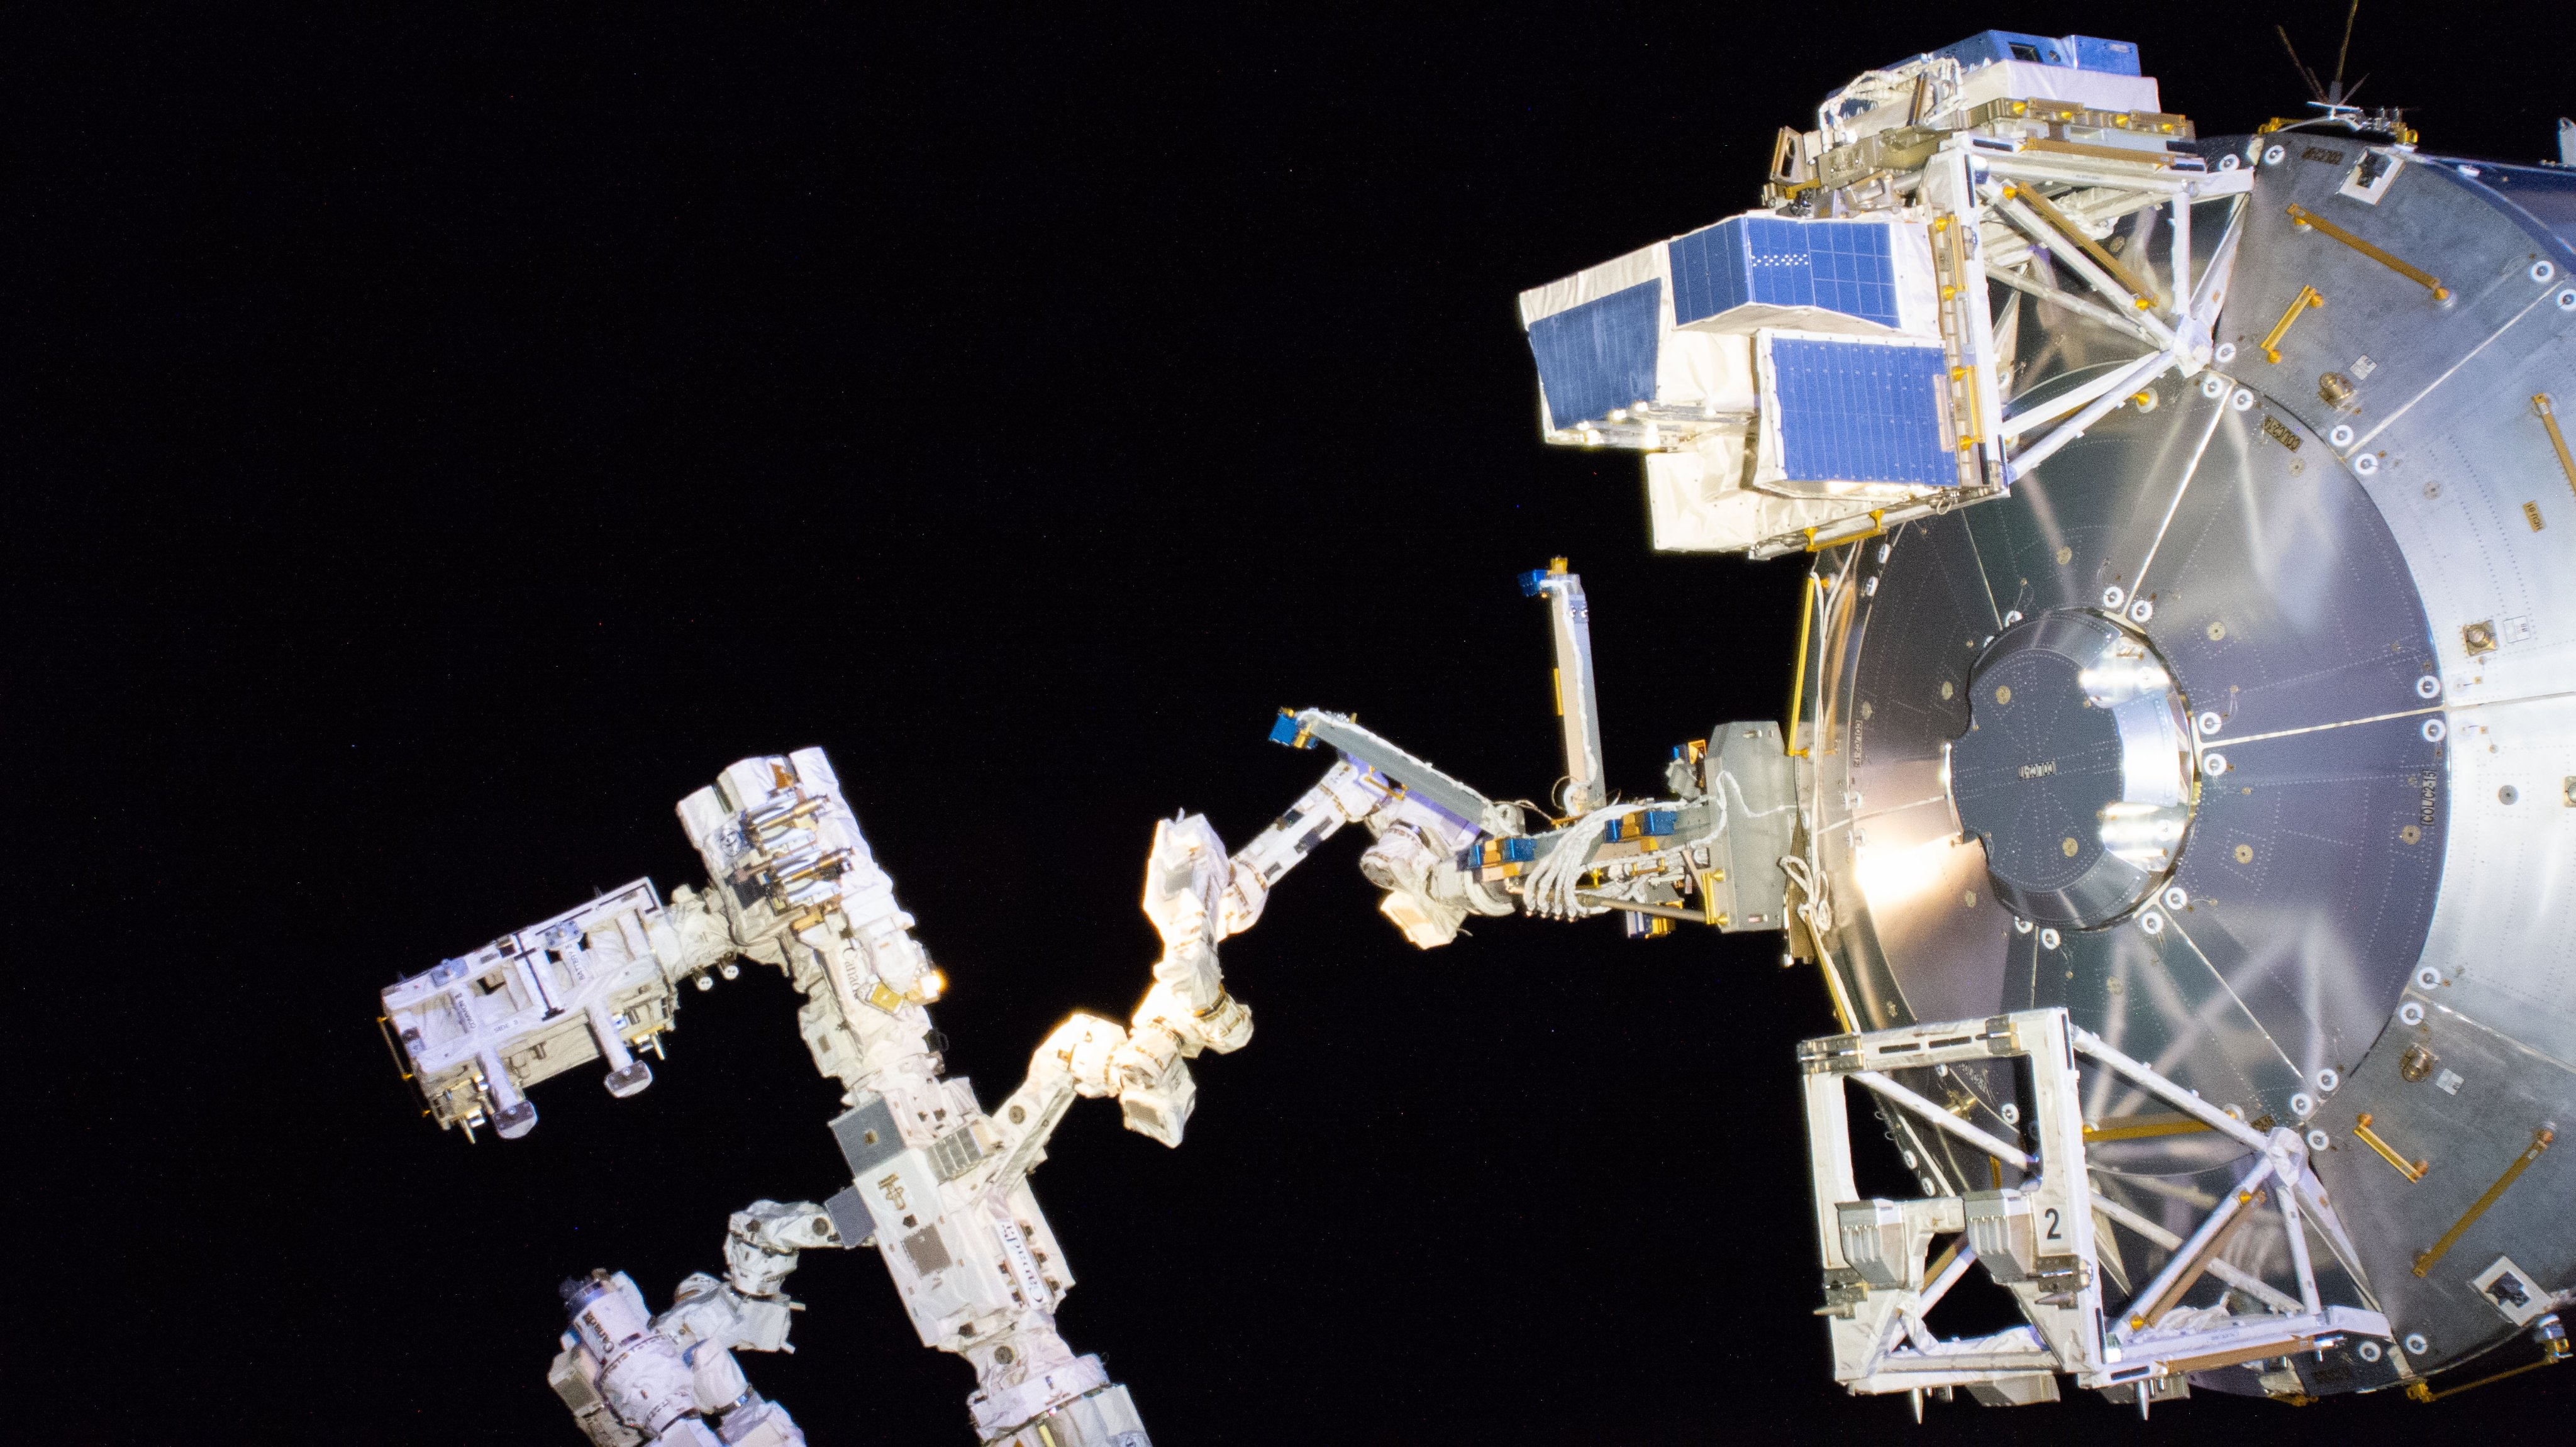 [ISS] Plateforme commerciale Bartolomeo fixée à Columbus - Page 2 EVA5ja-XgAATnGX?format=jpg&name=4096x4096